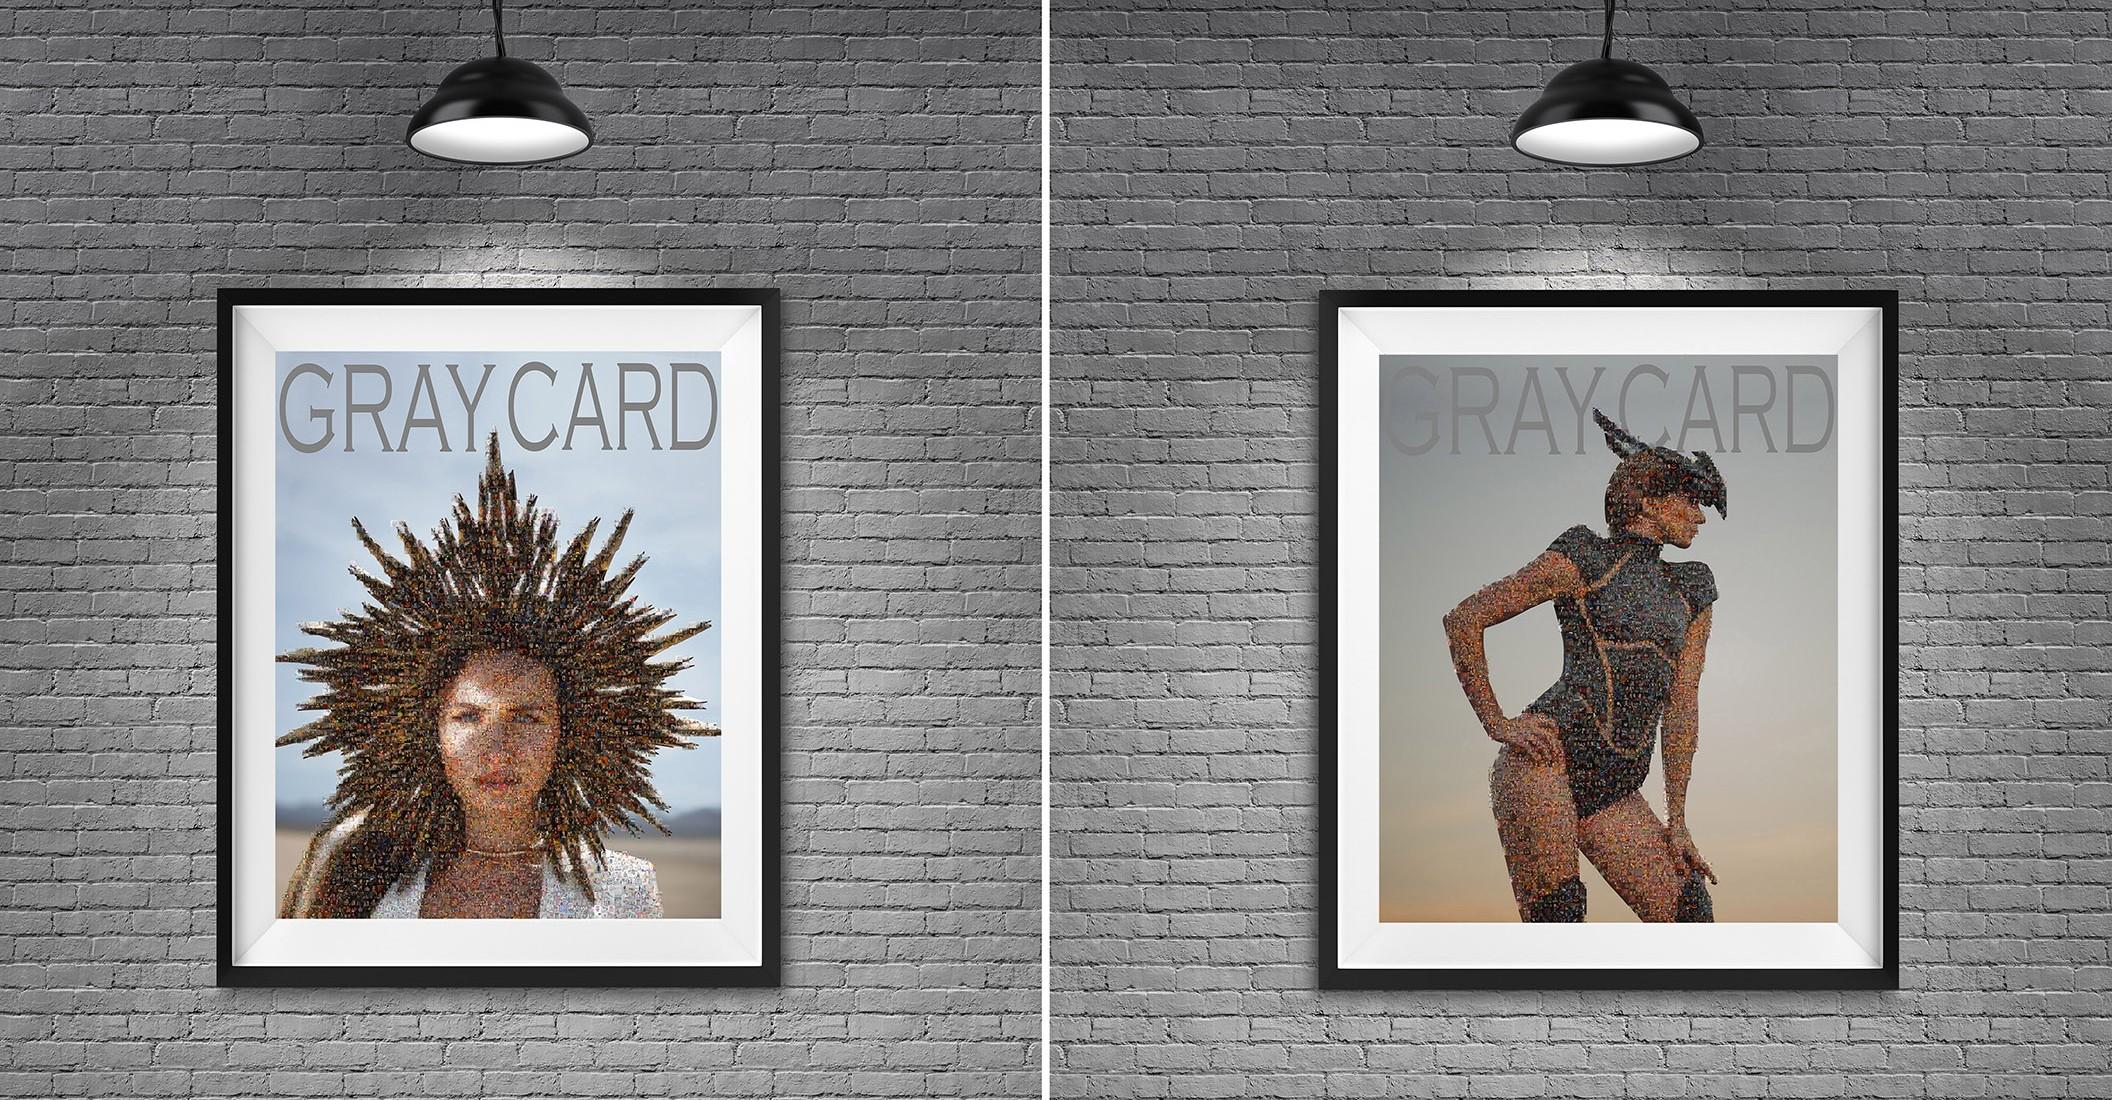 GRAY CARD   Mosaic Prints: Volume #